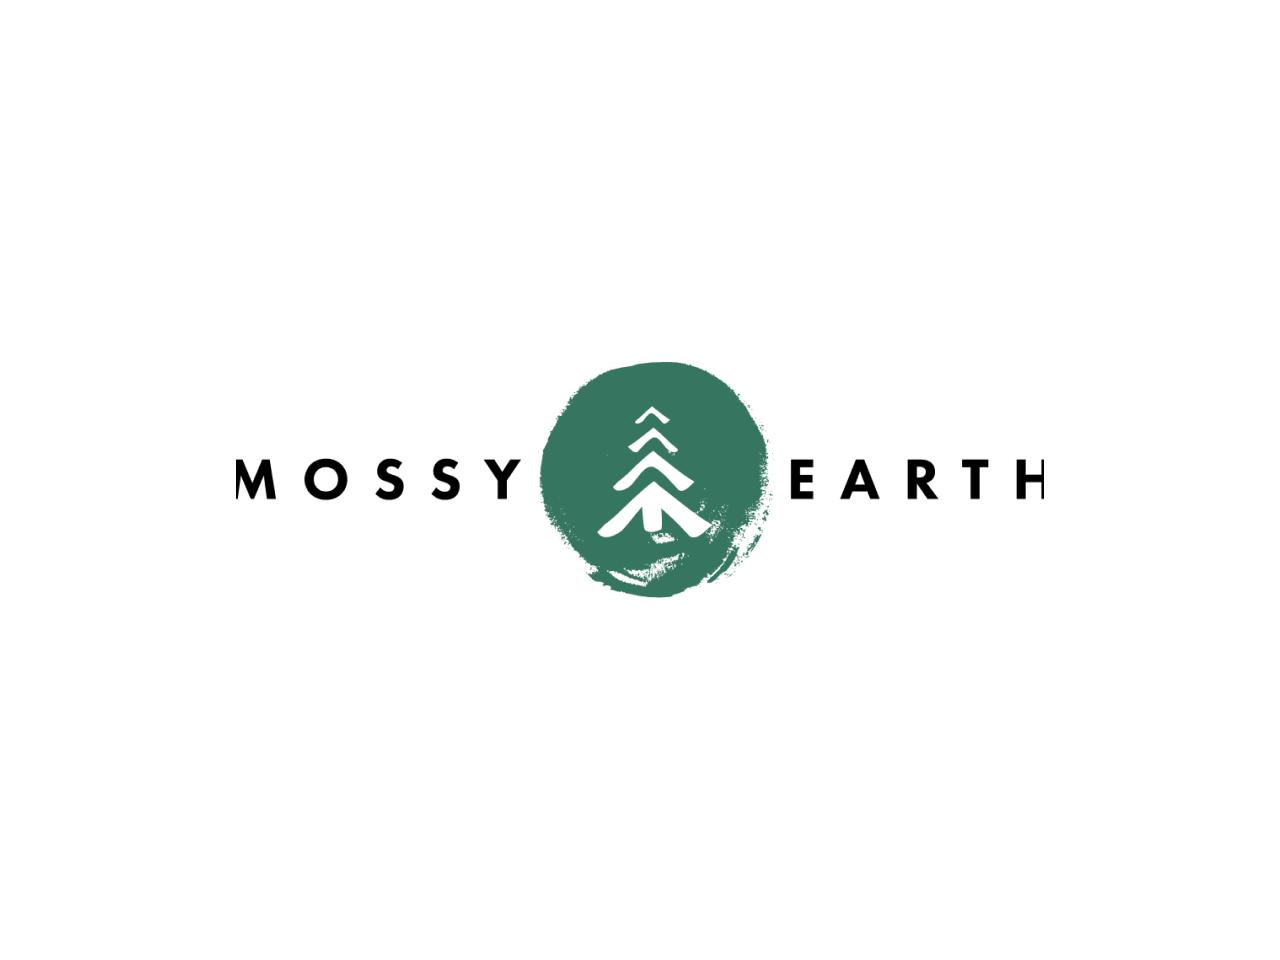 Mossy Earth